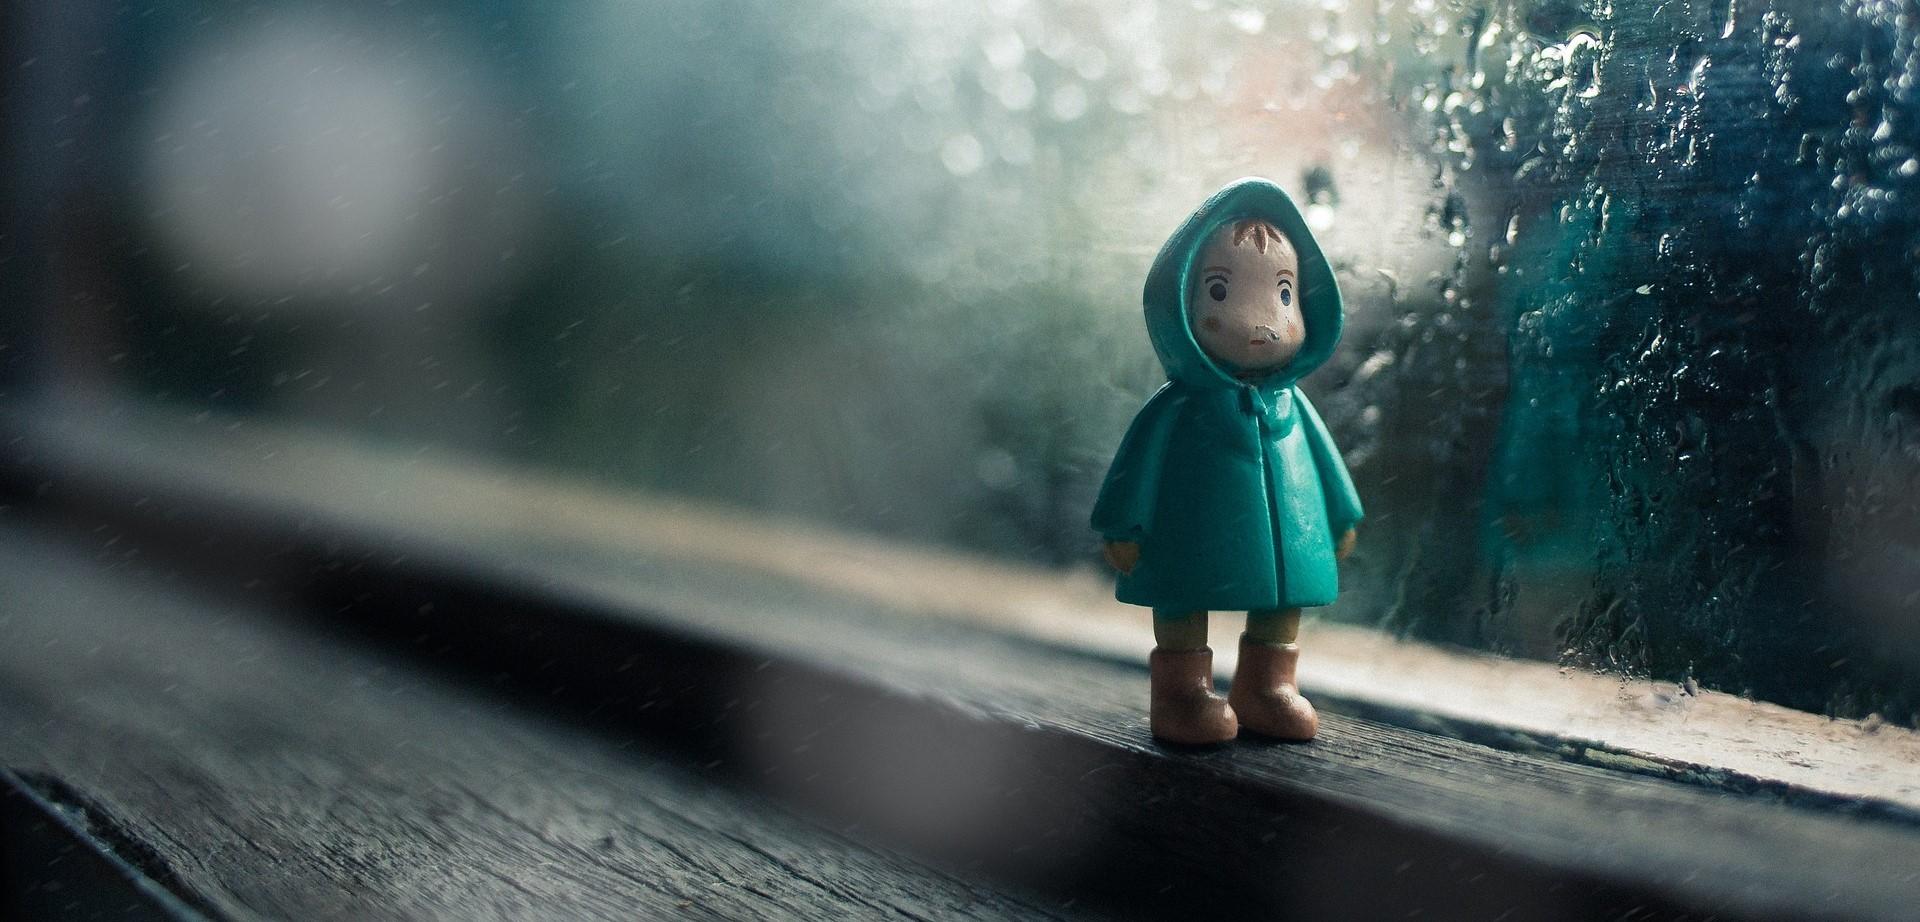 Sad Kid Figure | Kids Car Donations